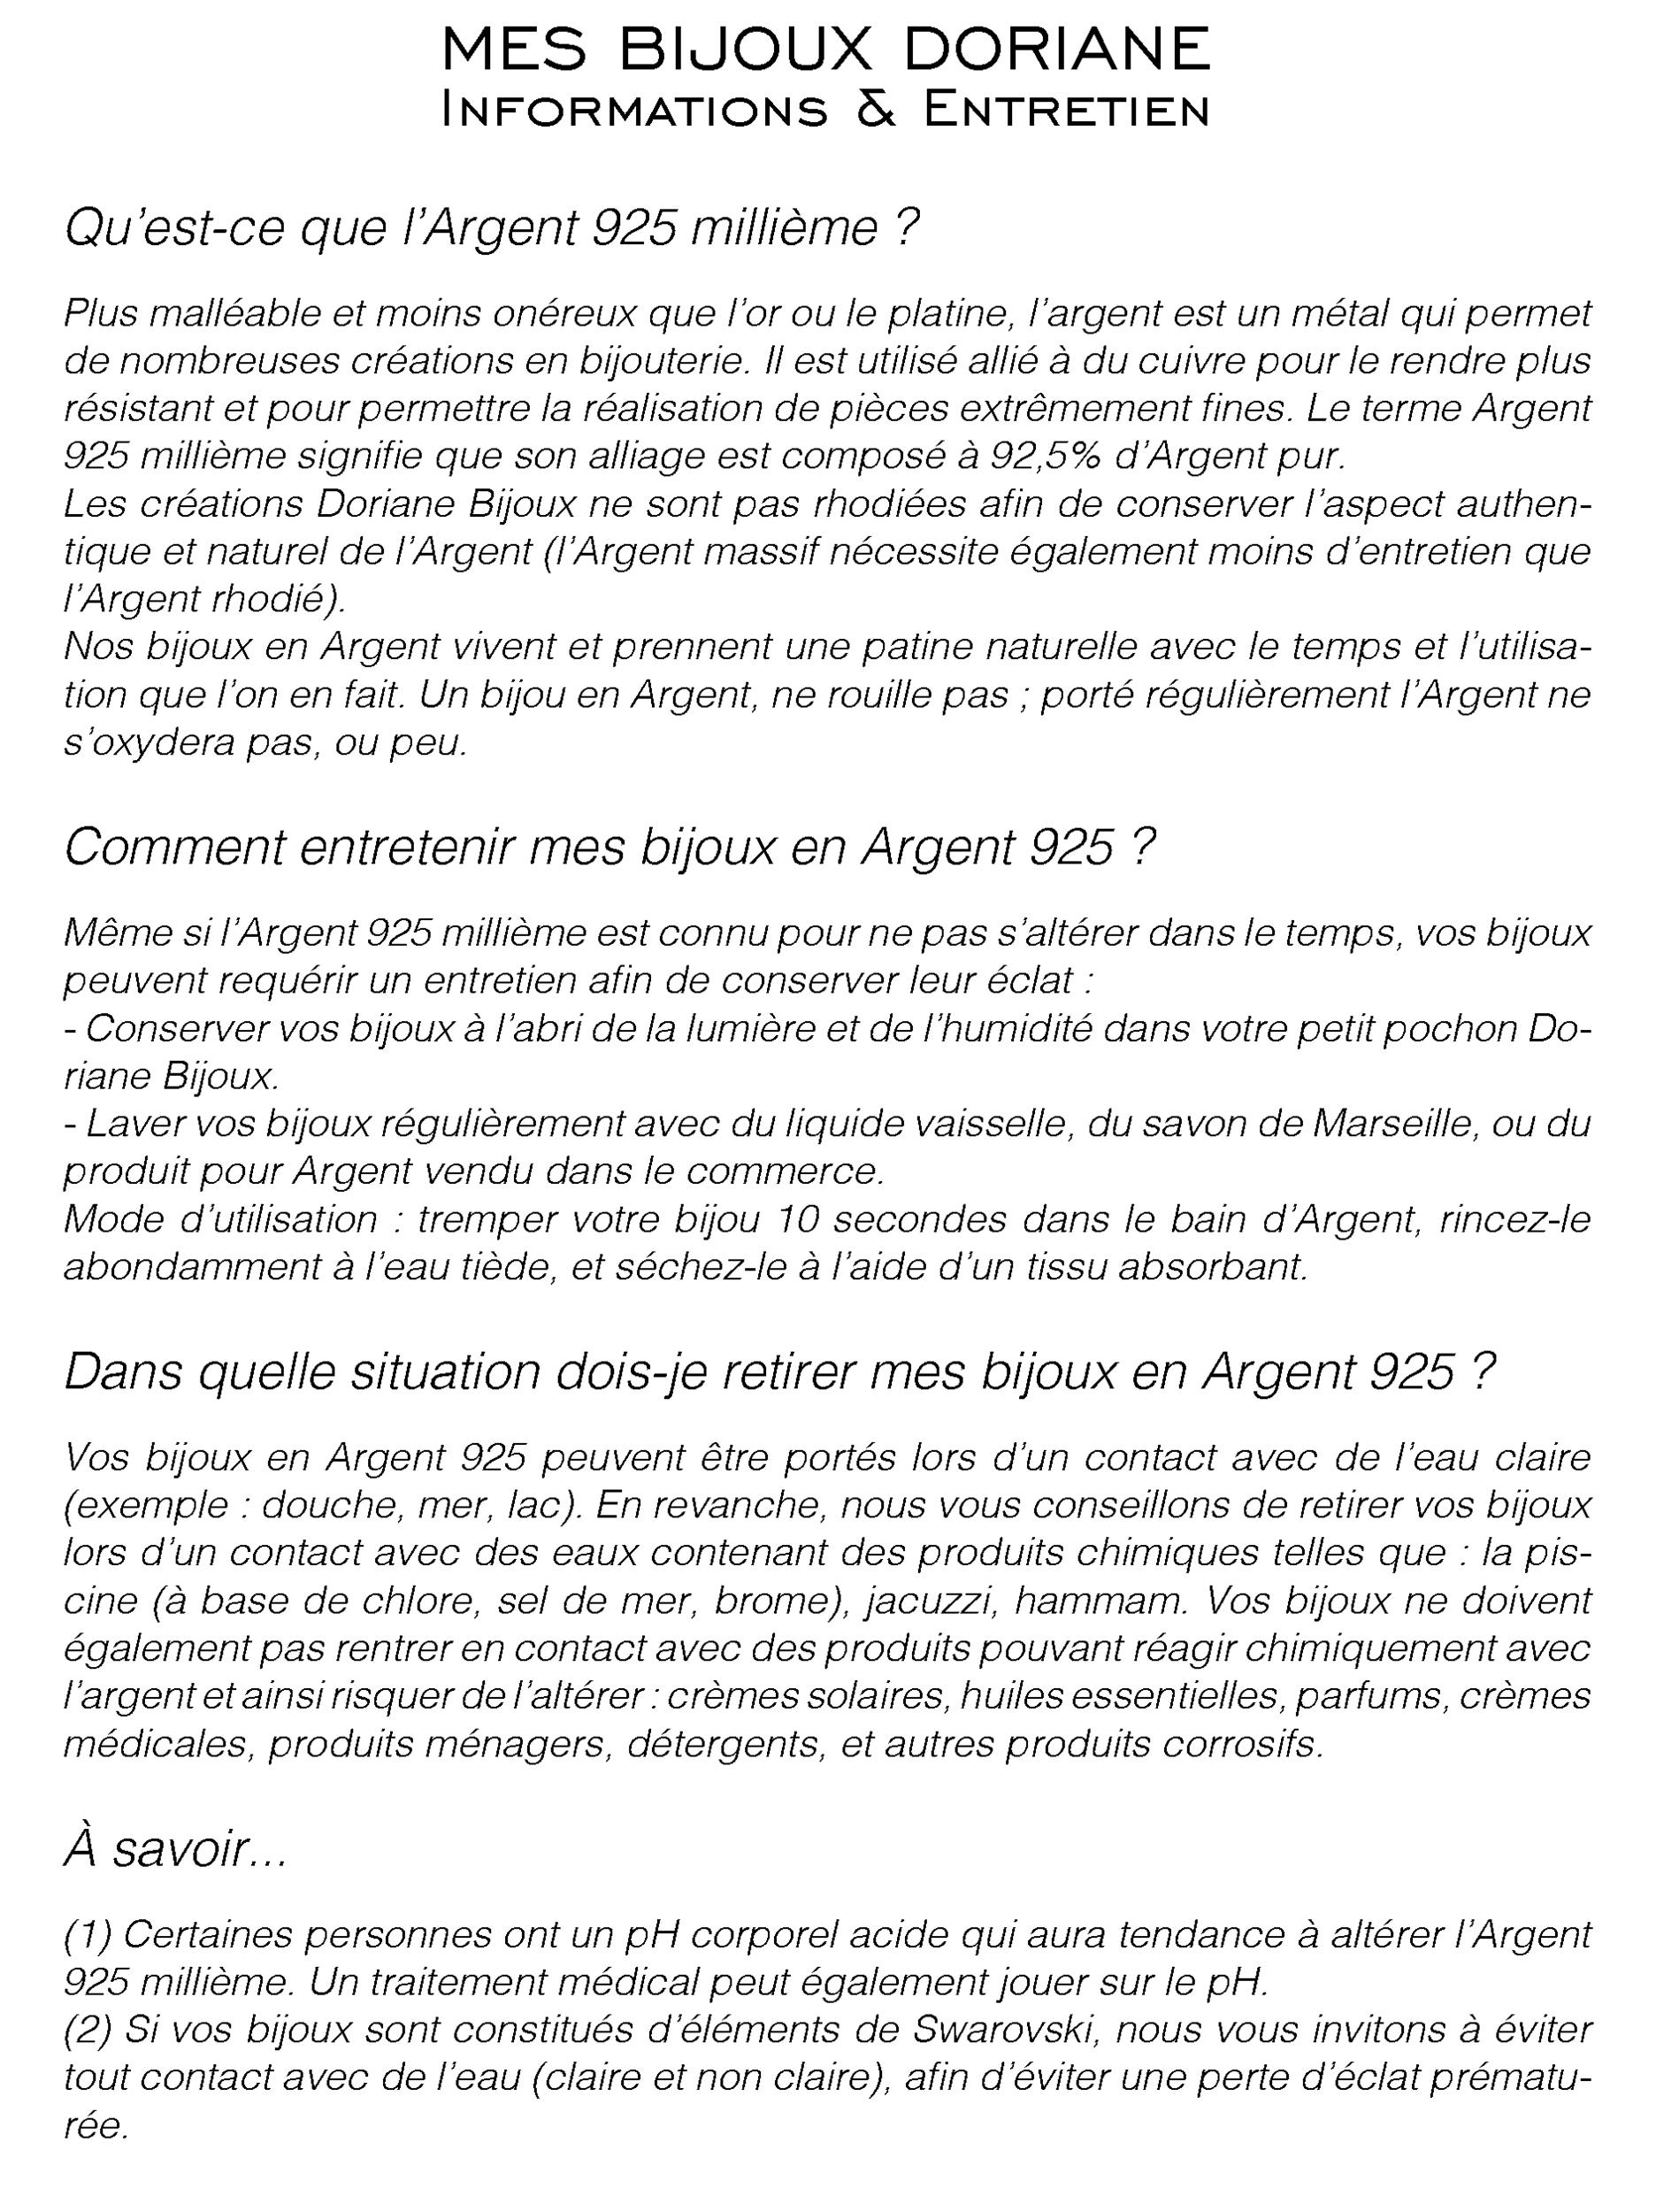 Les règles d'or Doriane Bijoux A6RV2